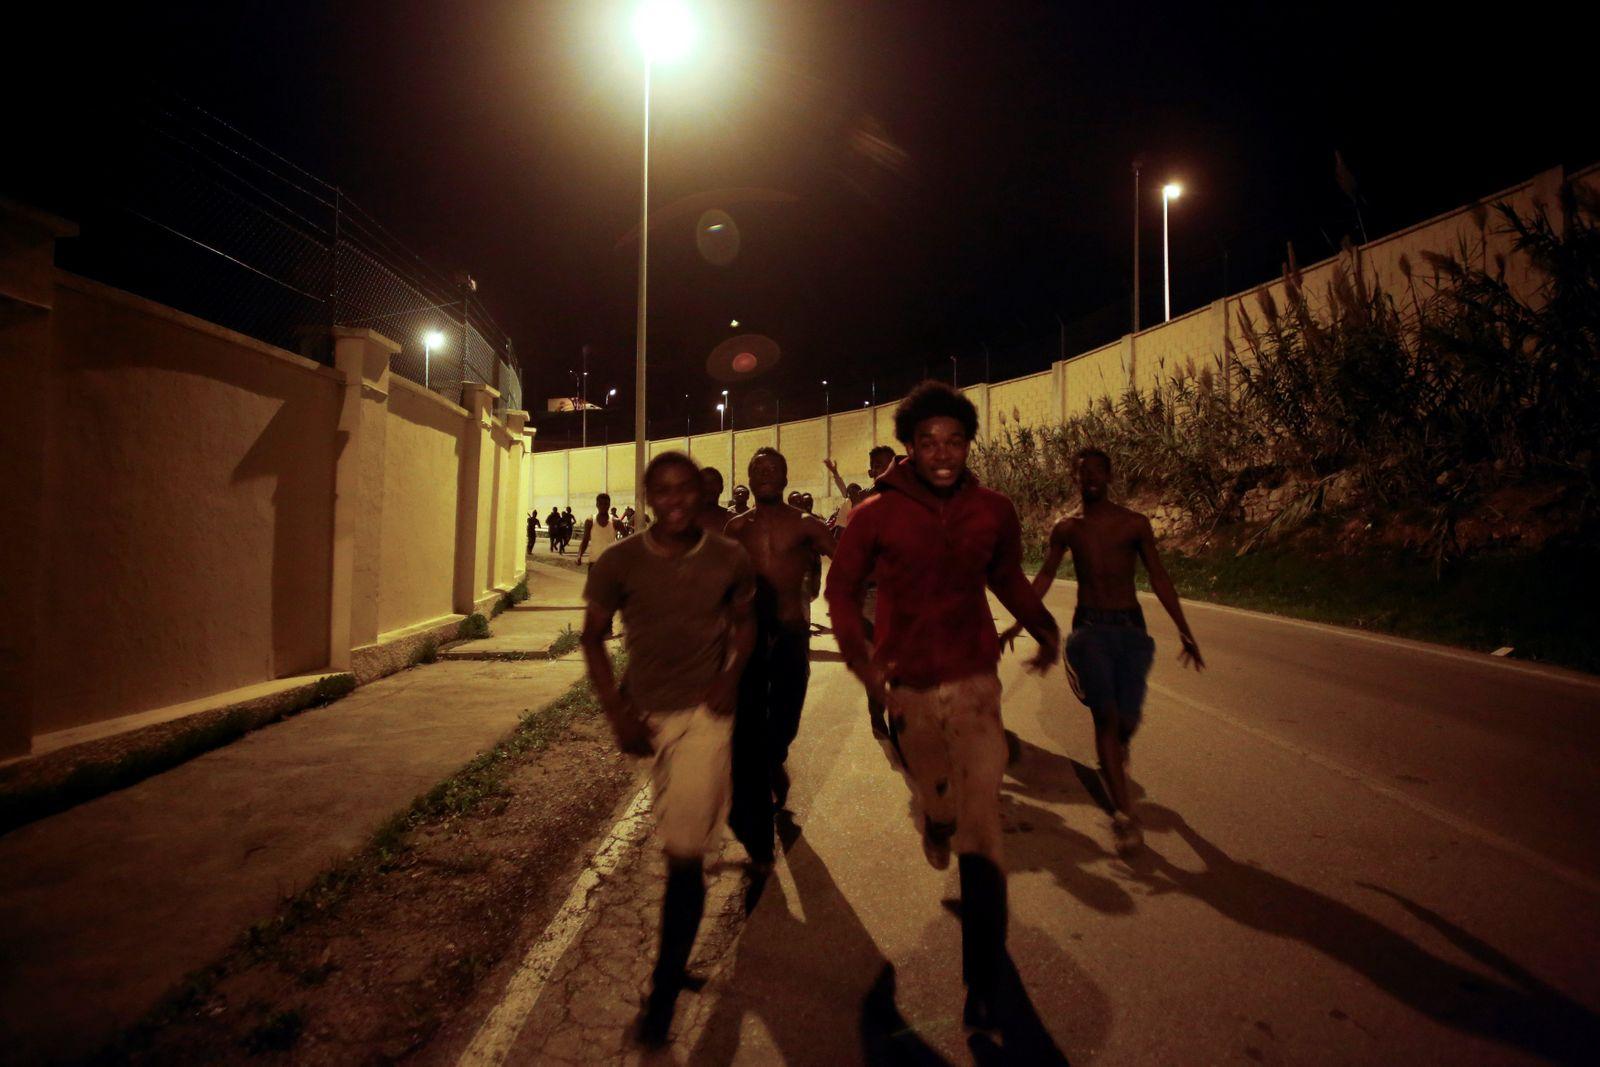 Spanien/ Marokko/ Ceuta/ Flüchtlinge